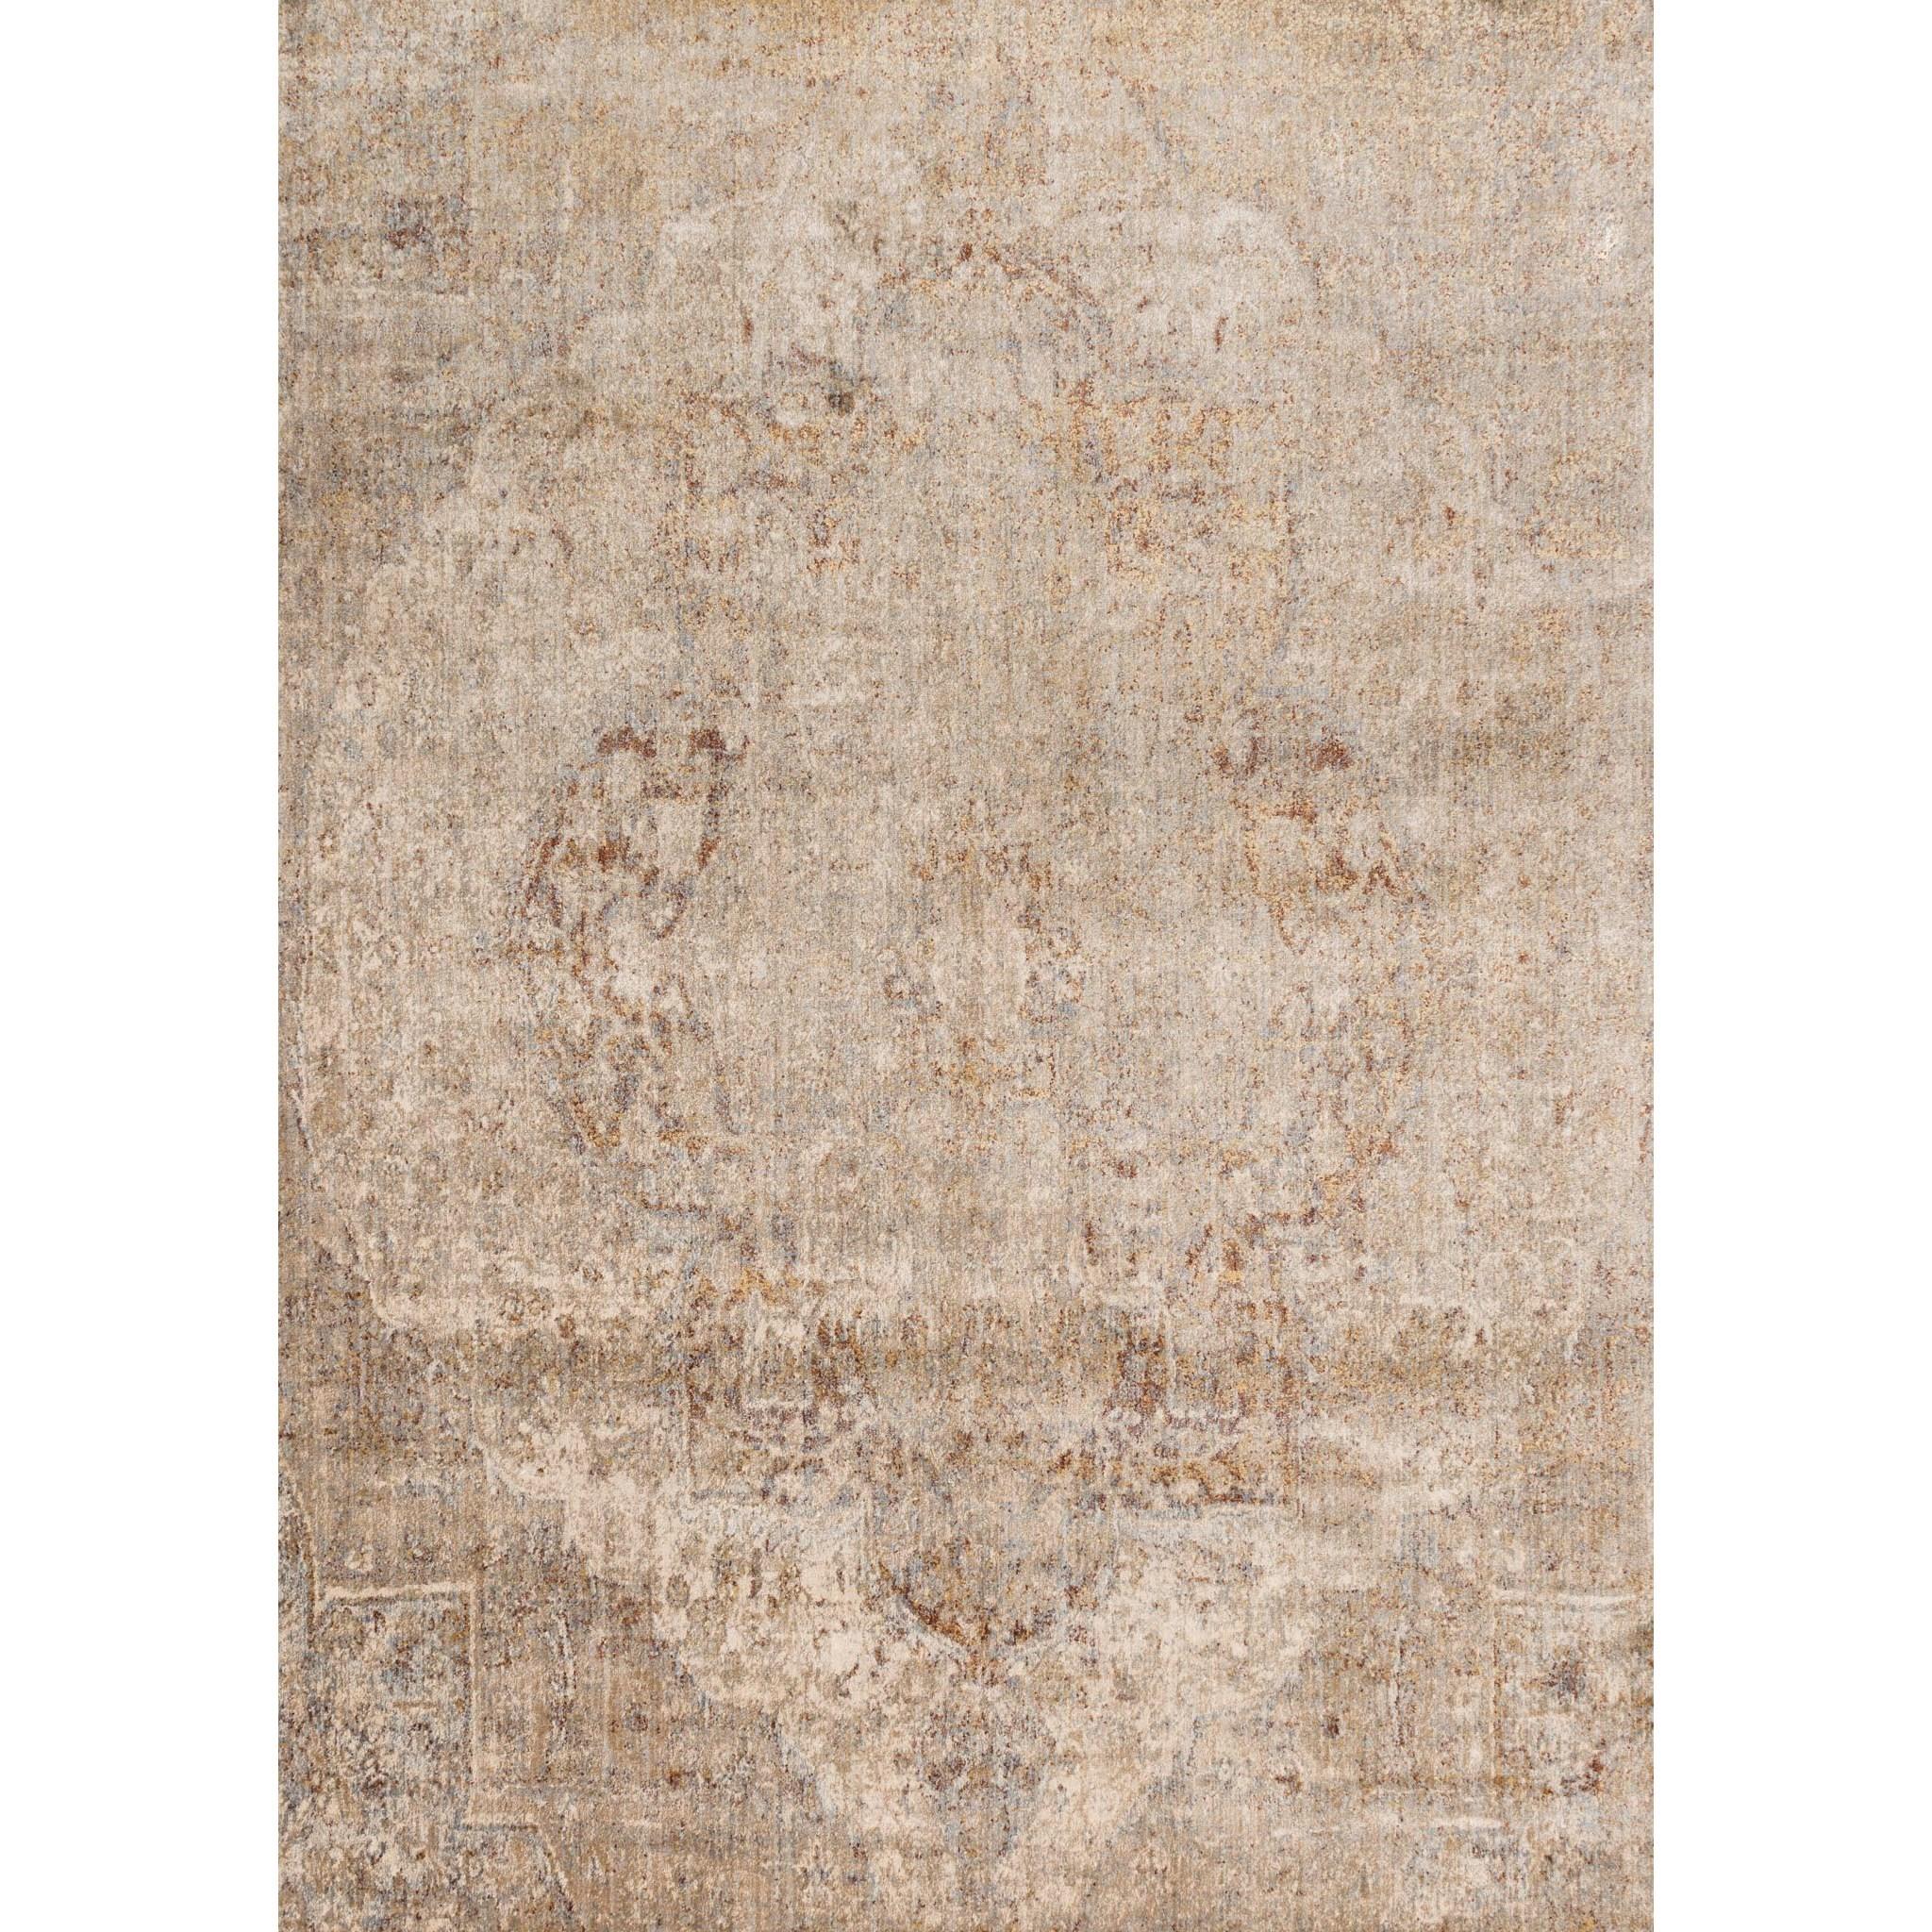 "Anastasia 6'-7"" X 9'-2"" Area Rug by Loloi Rugs at Virginia Furniture Market"